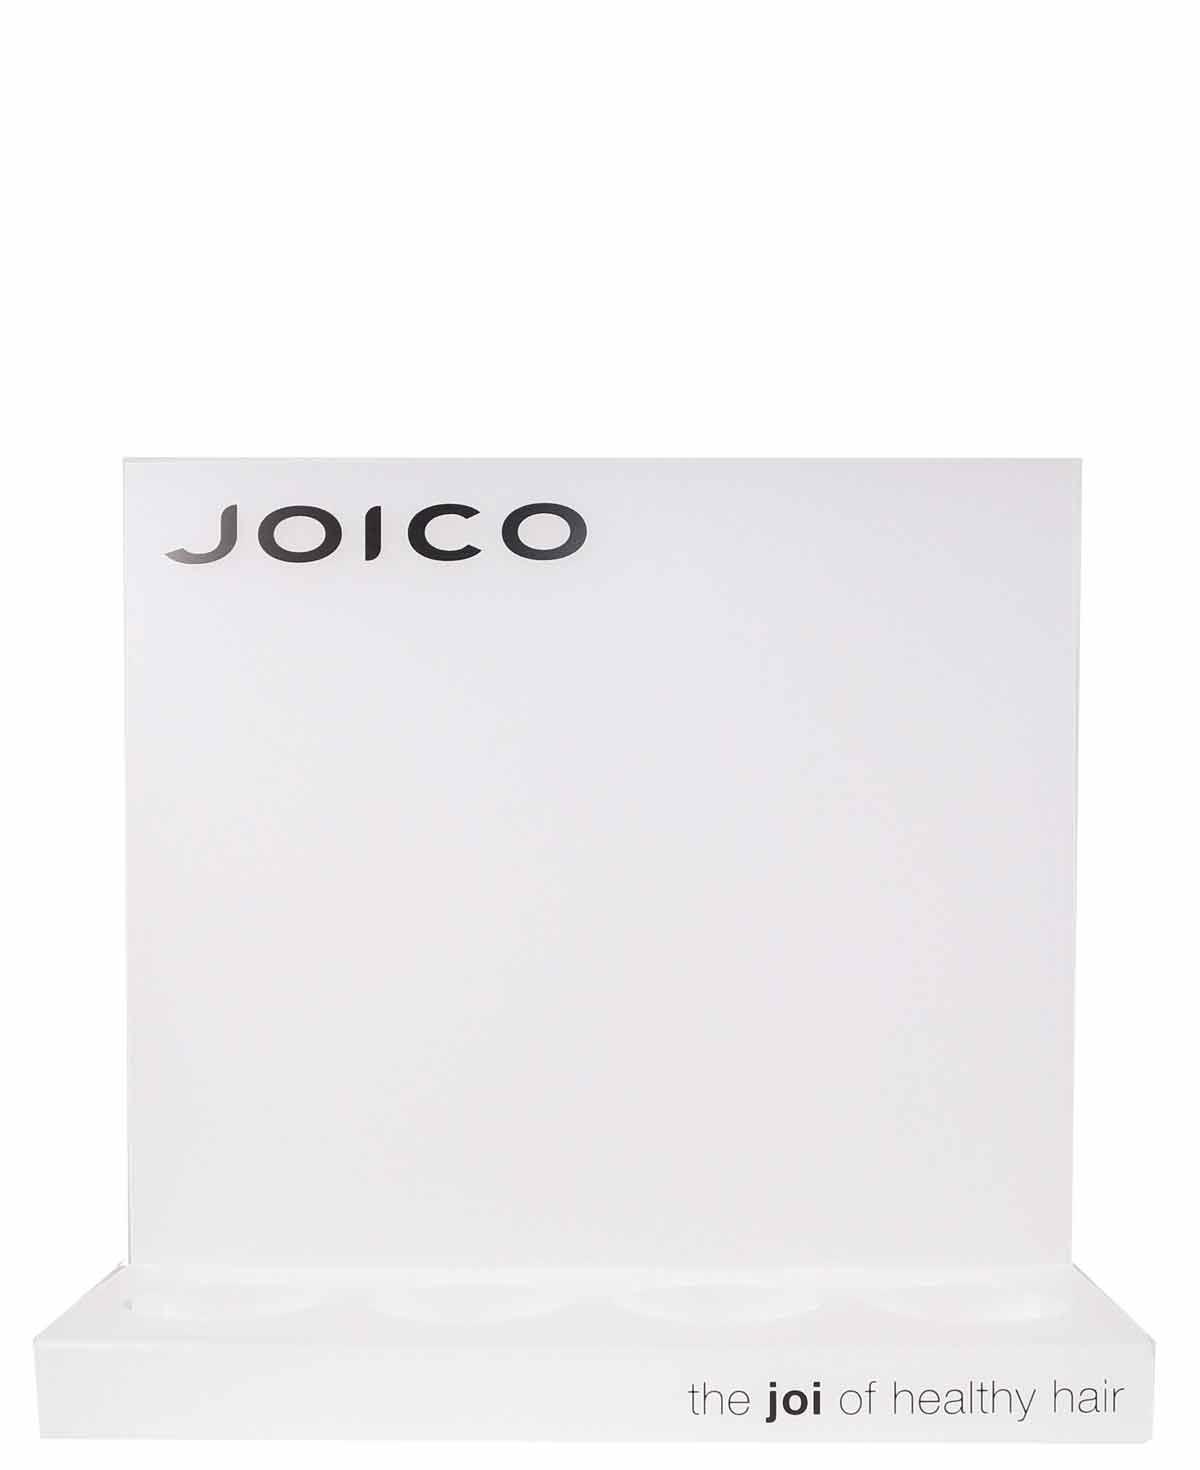 Joico Hair Backbar Tray